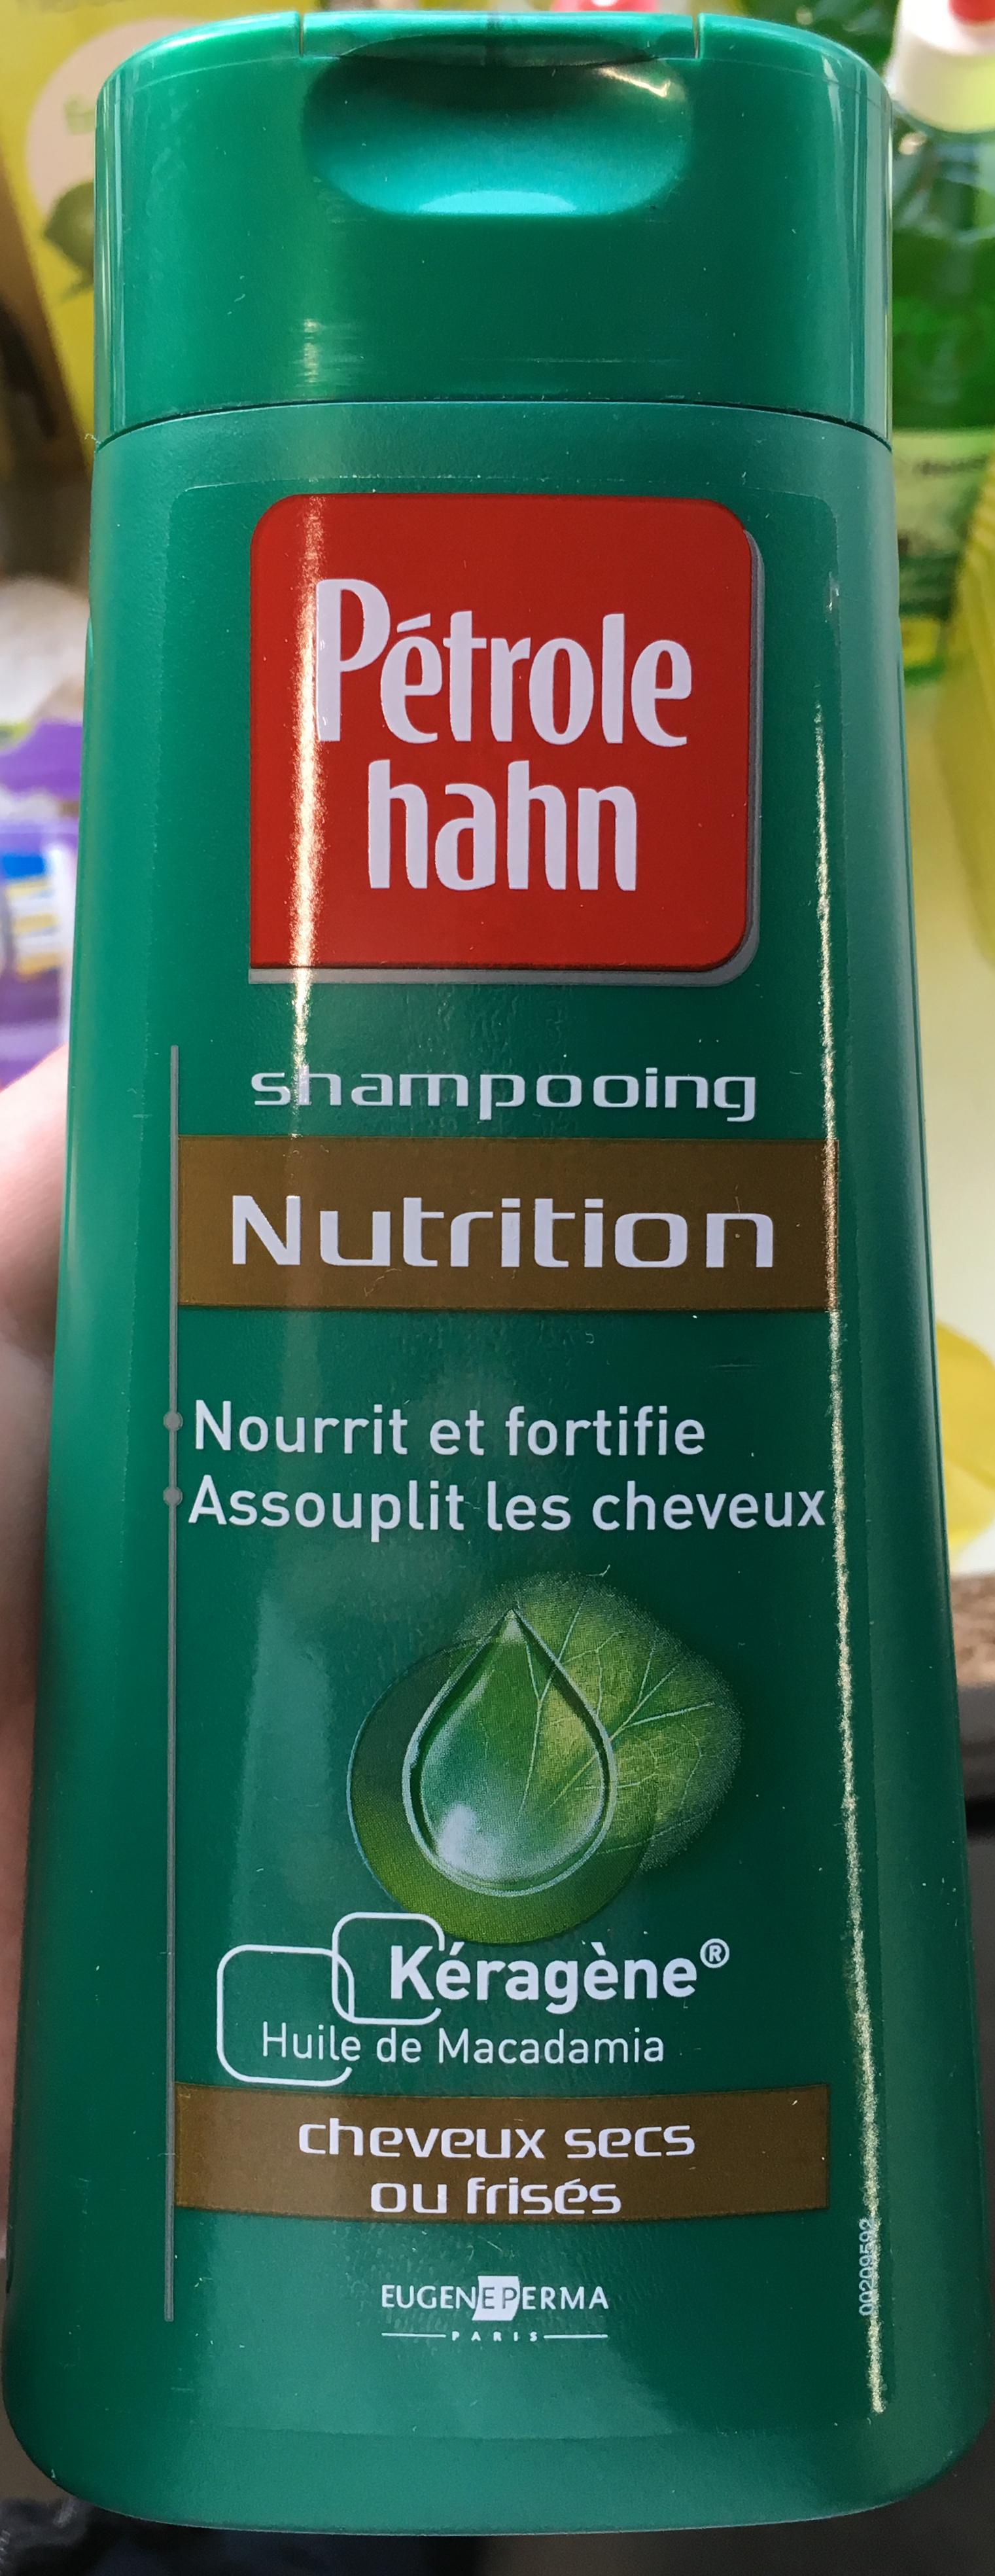 Shampooing Nutrition Kéragène Huile de Macadamia - Product - fr